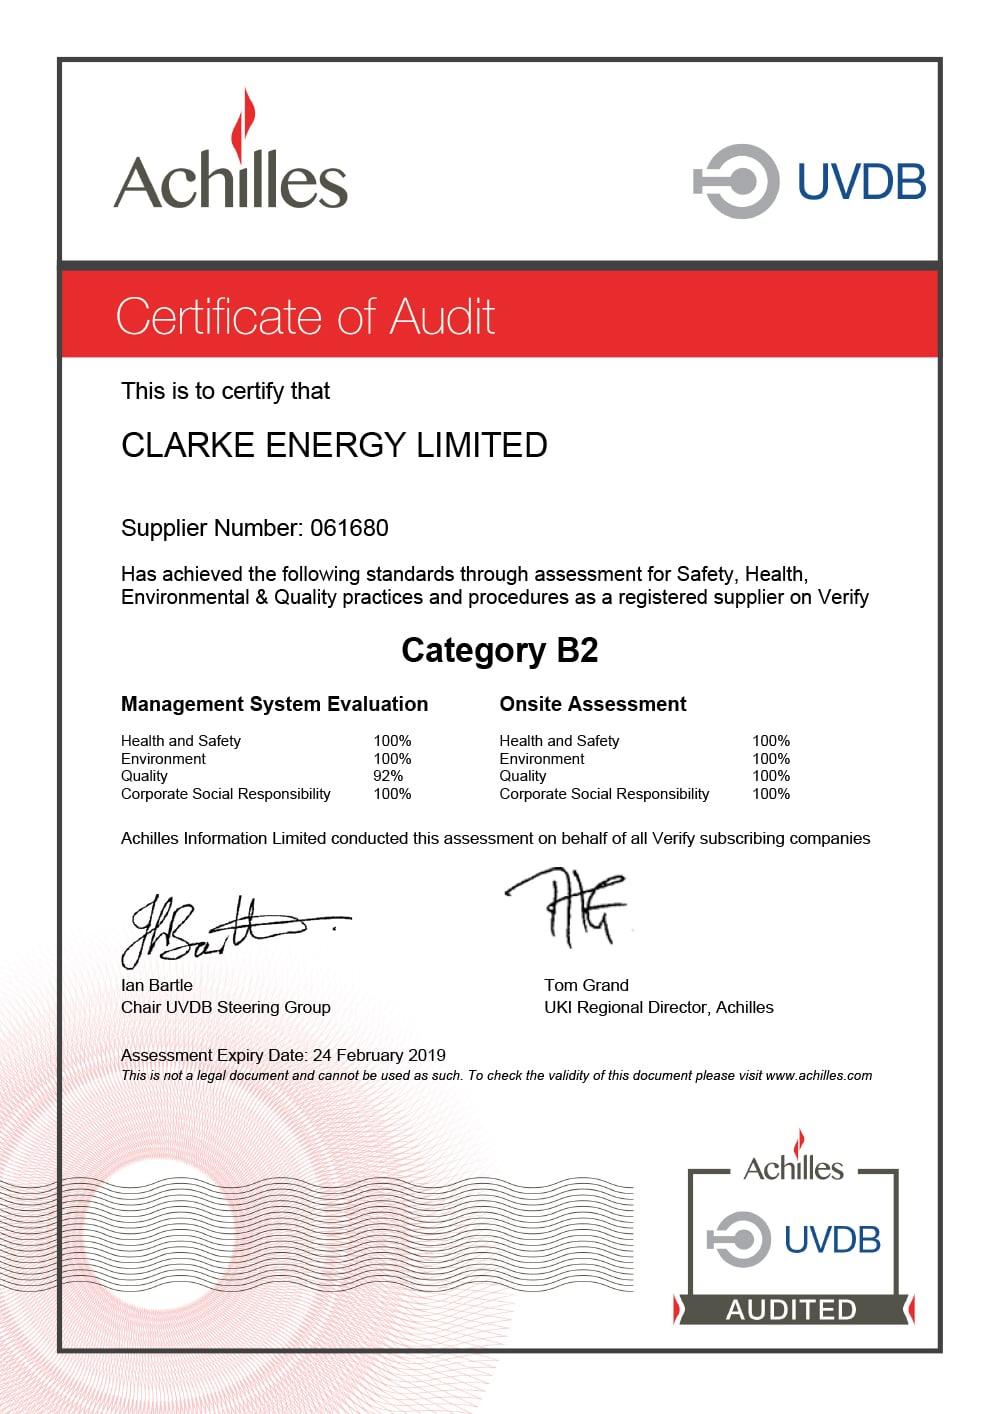 Achilles Audit Certificate